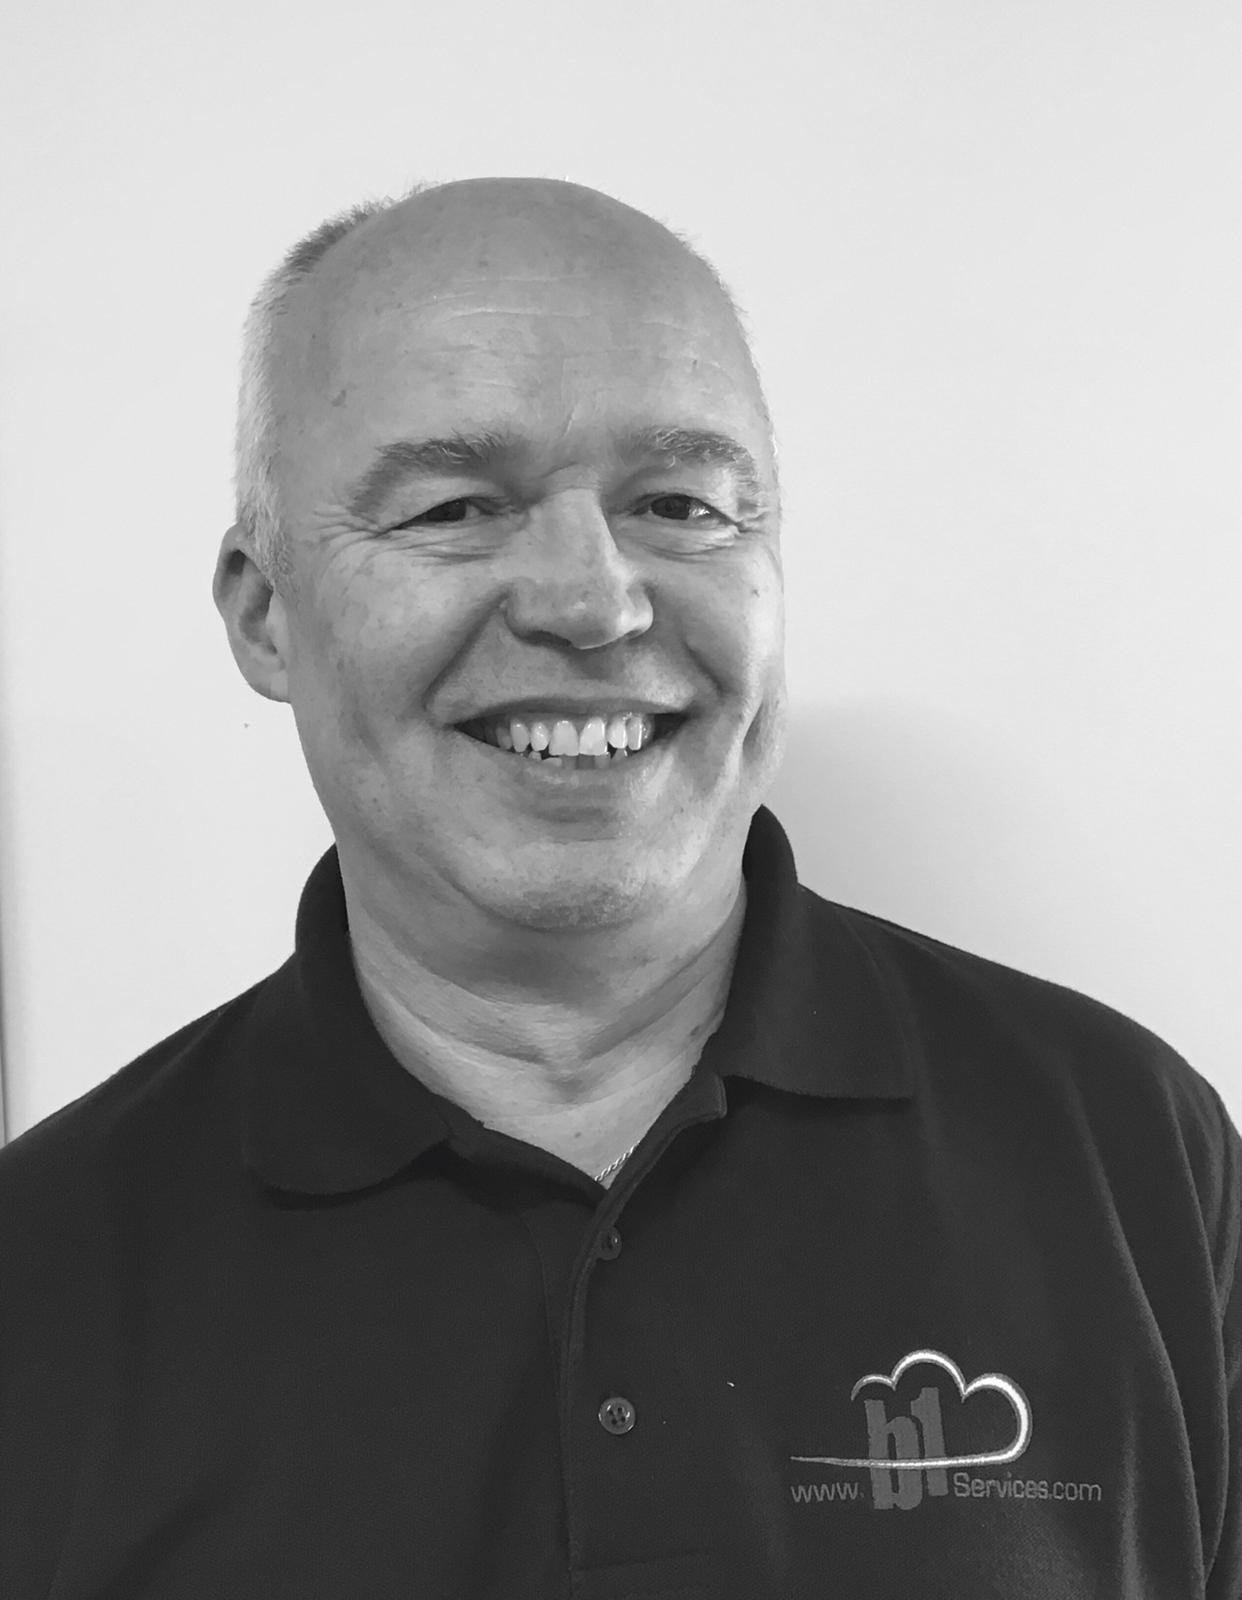 Martin Helt